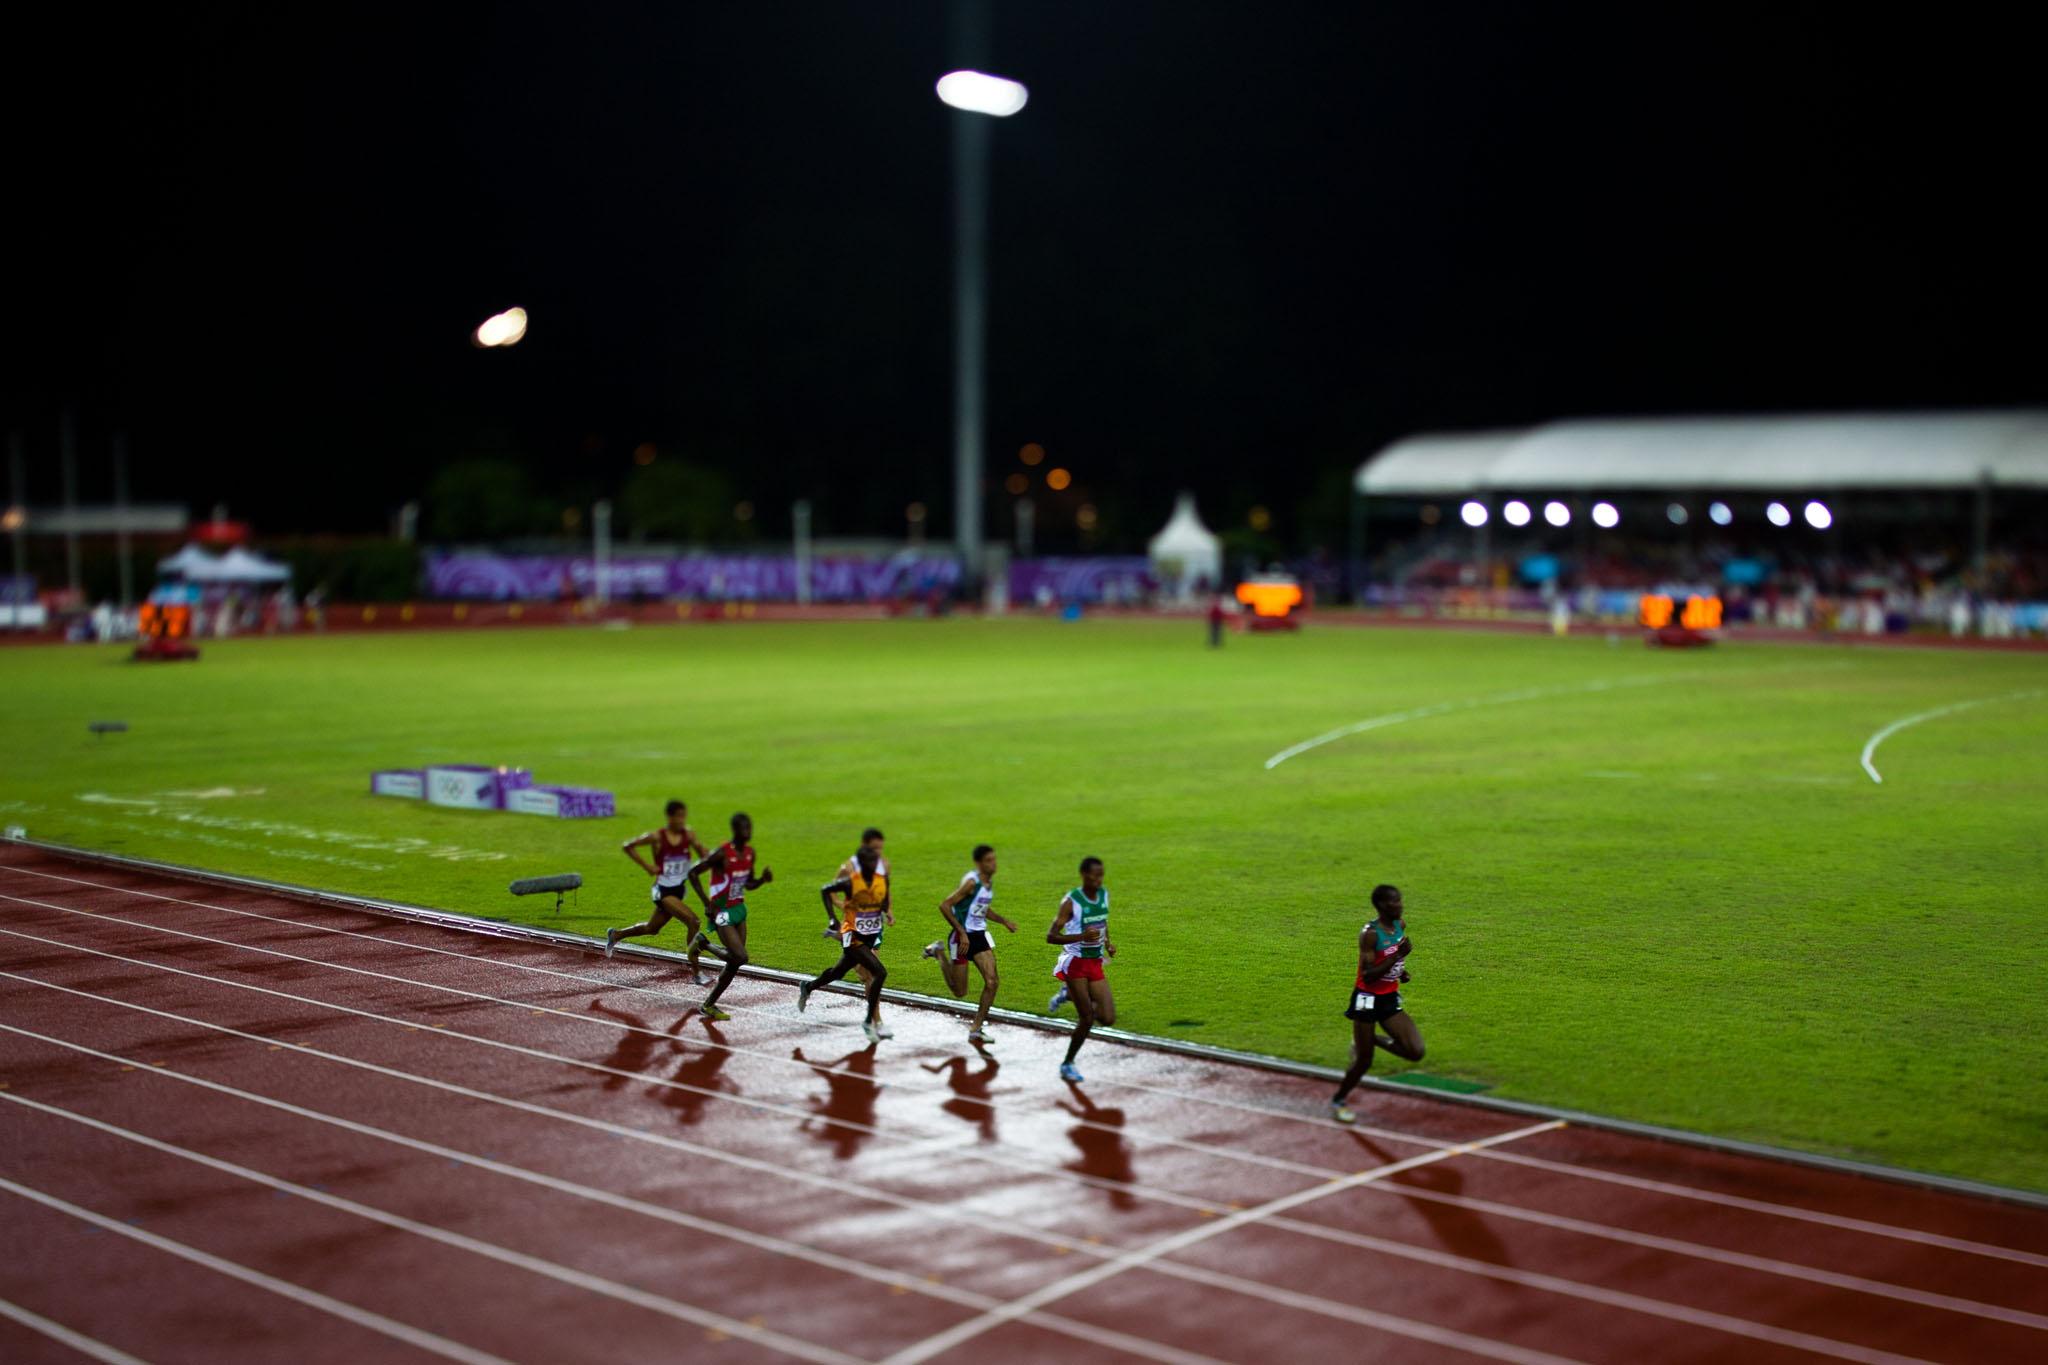 singapore-commercial-photographer-editorial-documentary-tiltshift-yog-olympic-games-olympics-zakaria-zainal-05.jpg